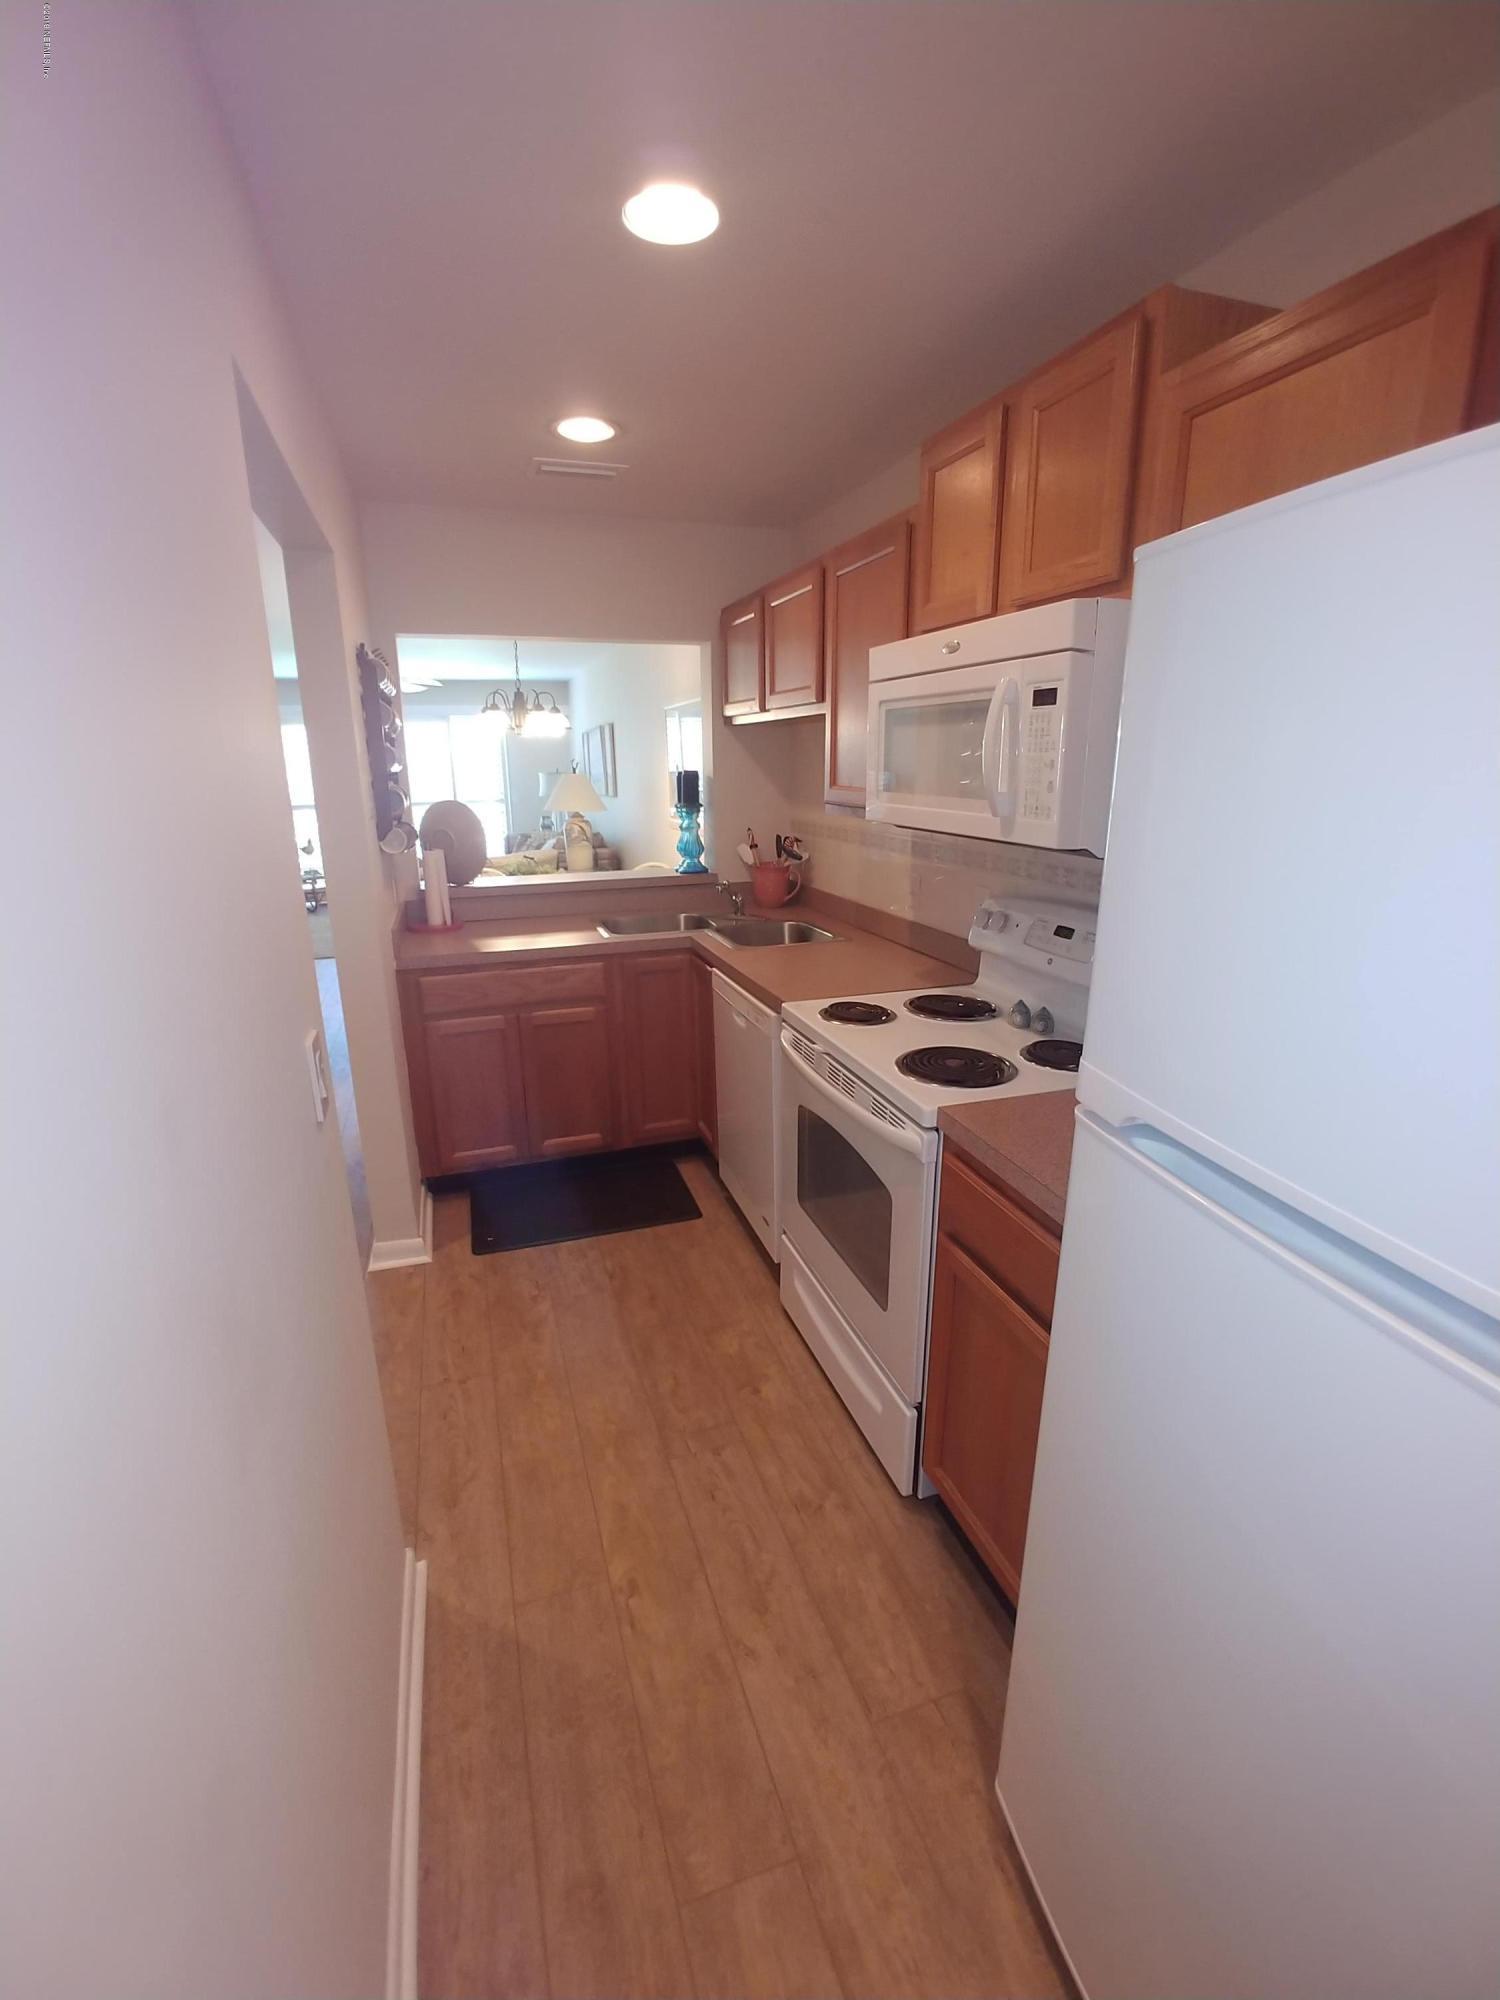 8550 A1A, ST AUGUSTINE, FLORIDA 32080, 2 Bedrooms Bedrooms, ,2 BathroomsBathrooms,Condo,For sale,A1A,995842